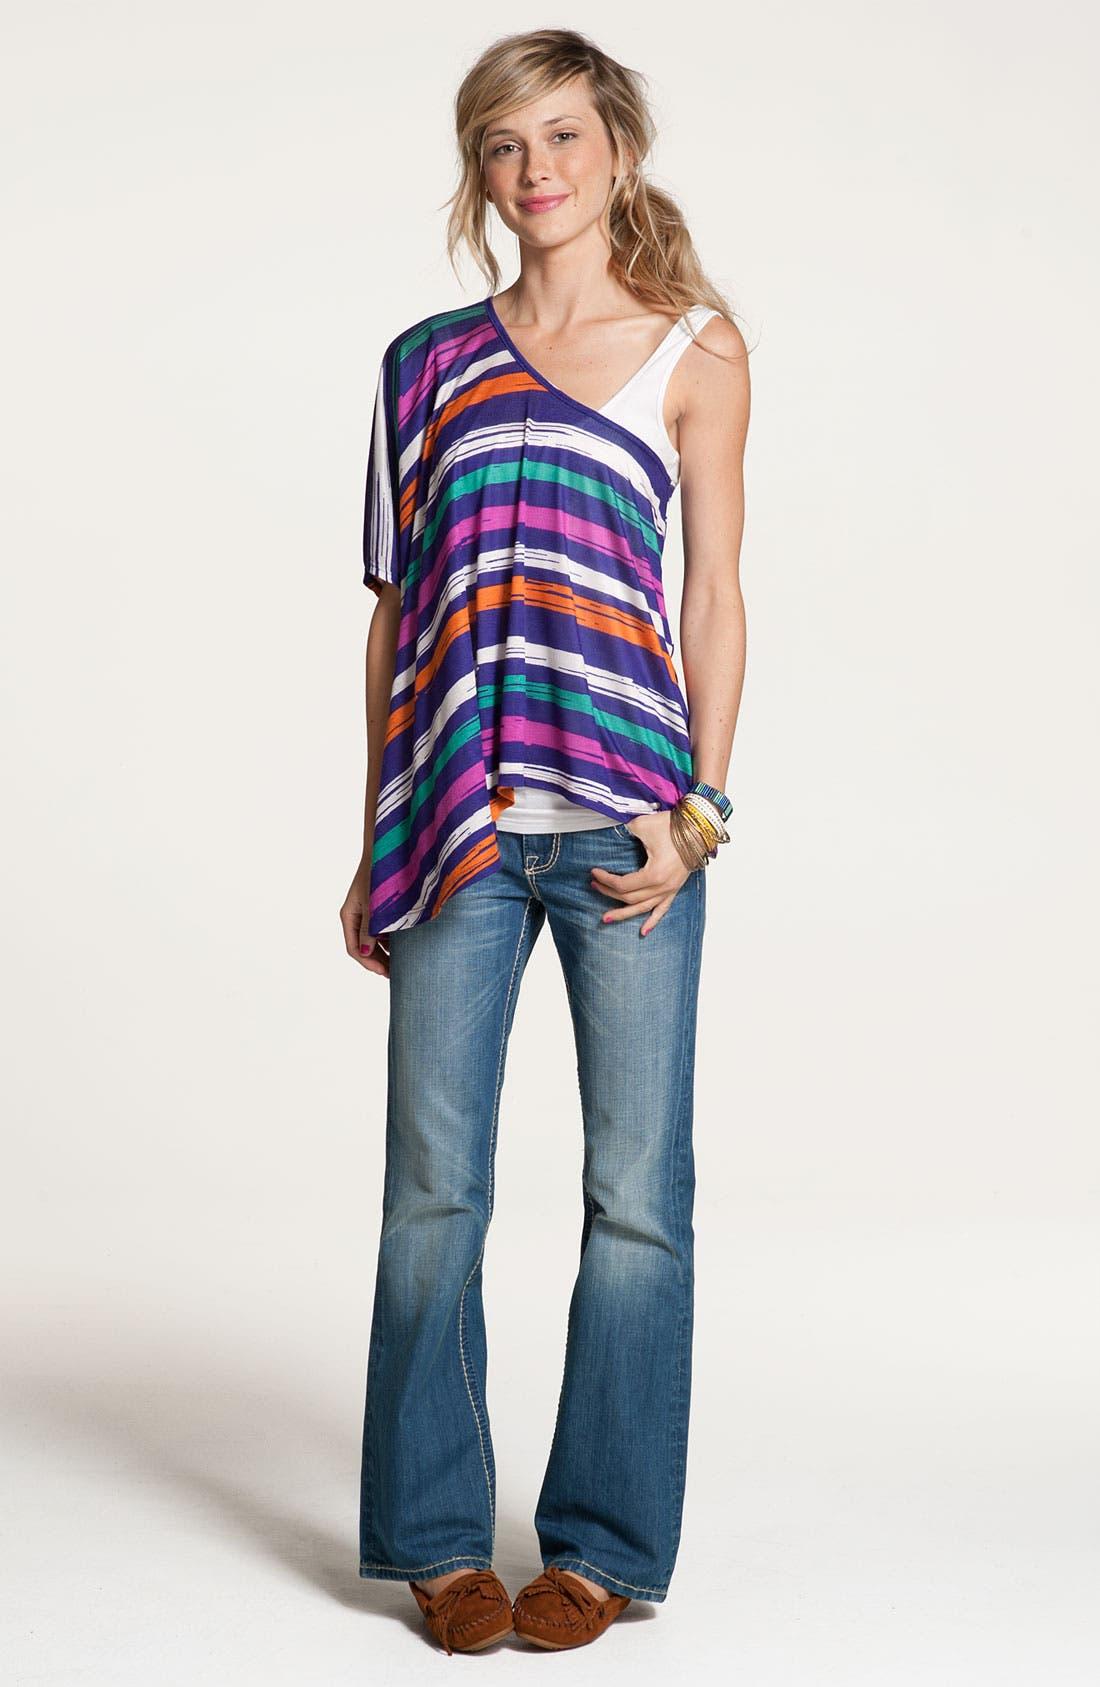 Main Image - Lush Top & Big Star Bootcut Jeans